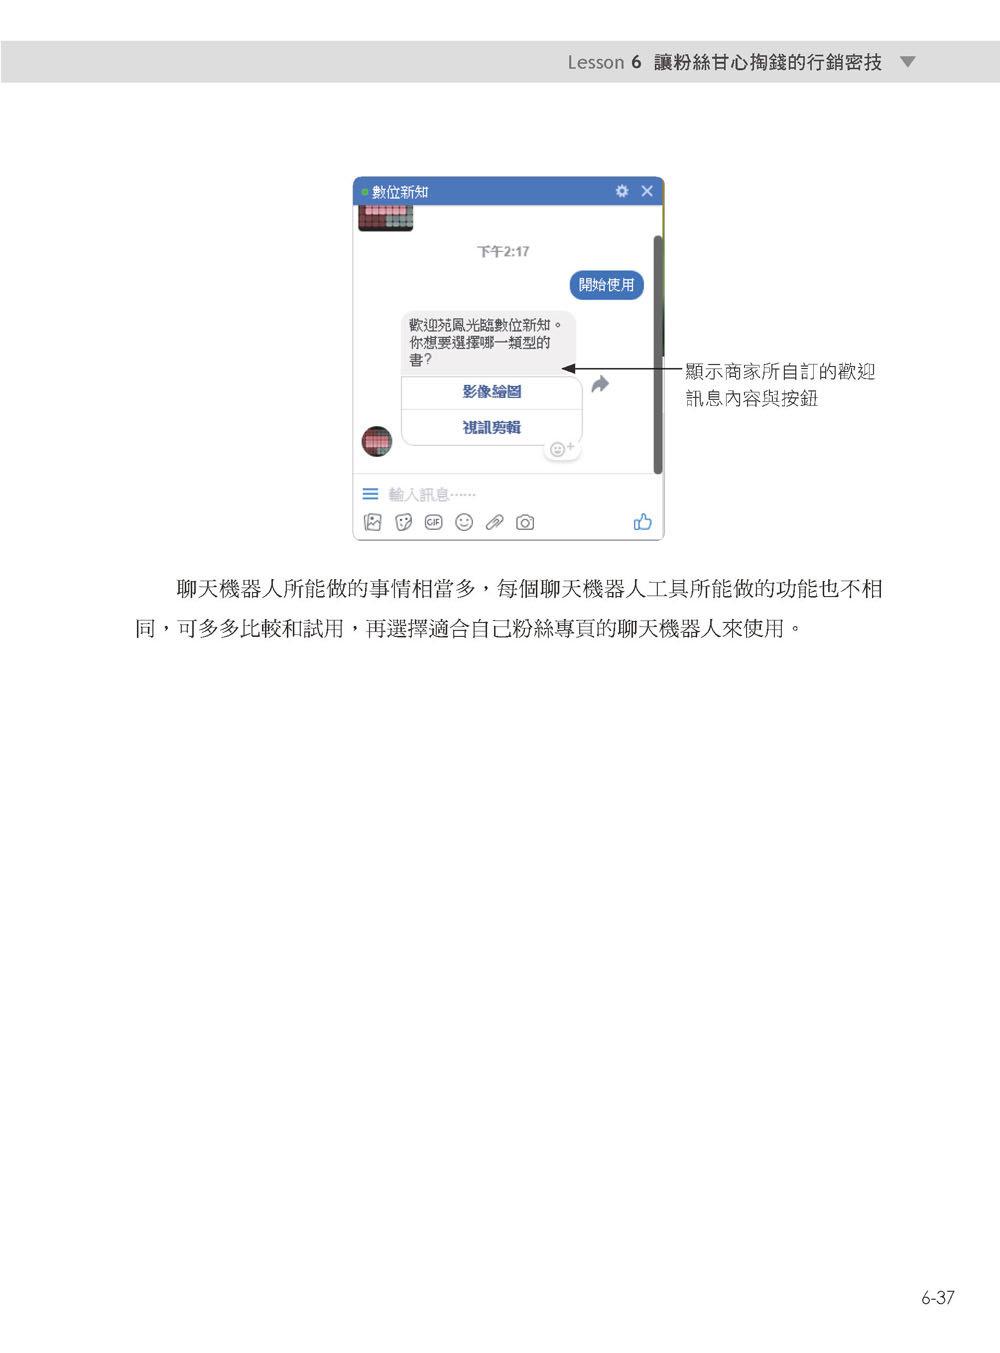 Facebook 互動行銷:社群口碑經營新思路+廣告投放如何有成效,想做好臉書行銷,操作心法就在這!-preview-56